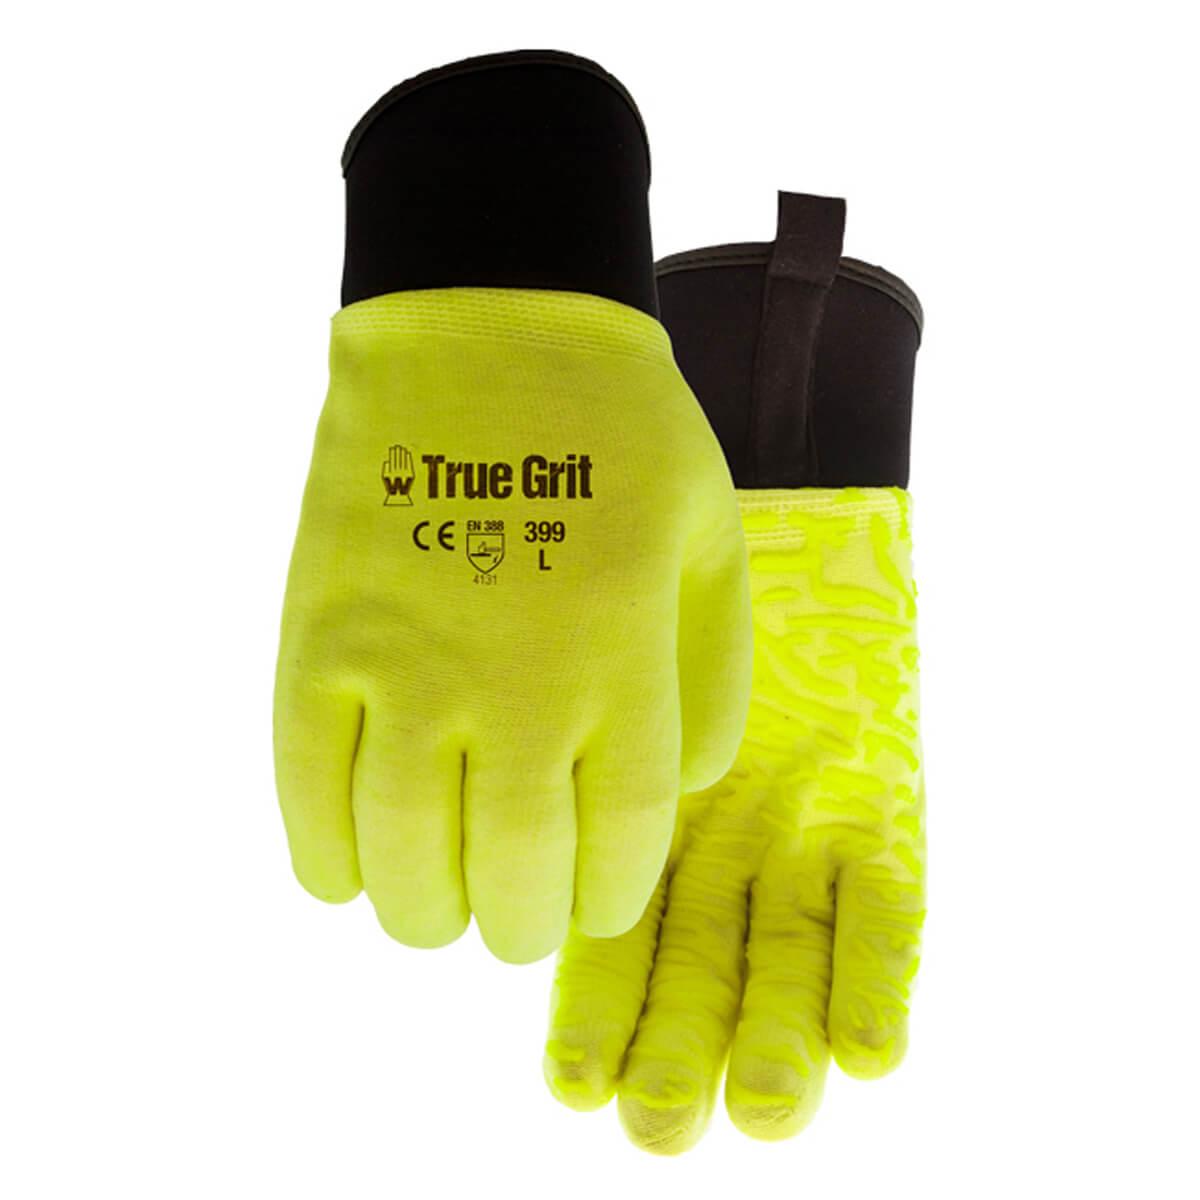 True Grit Gloves - L